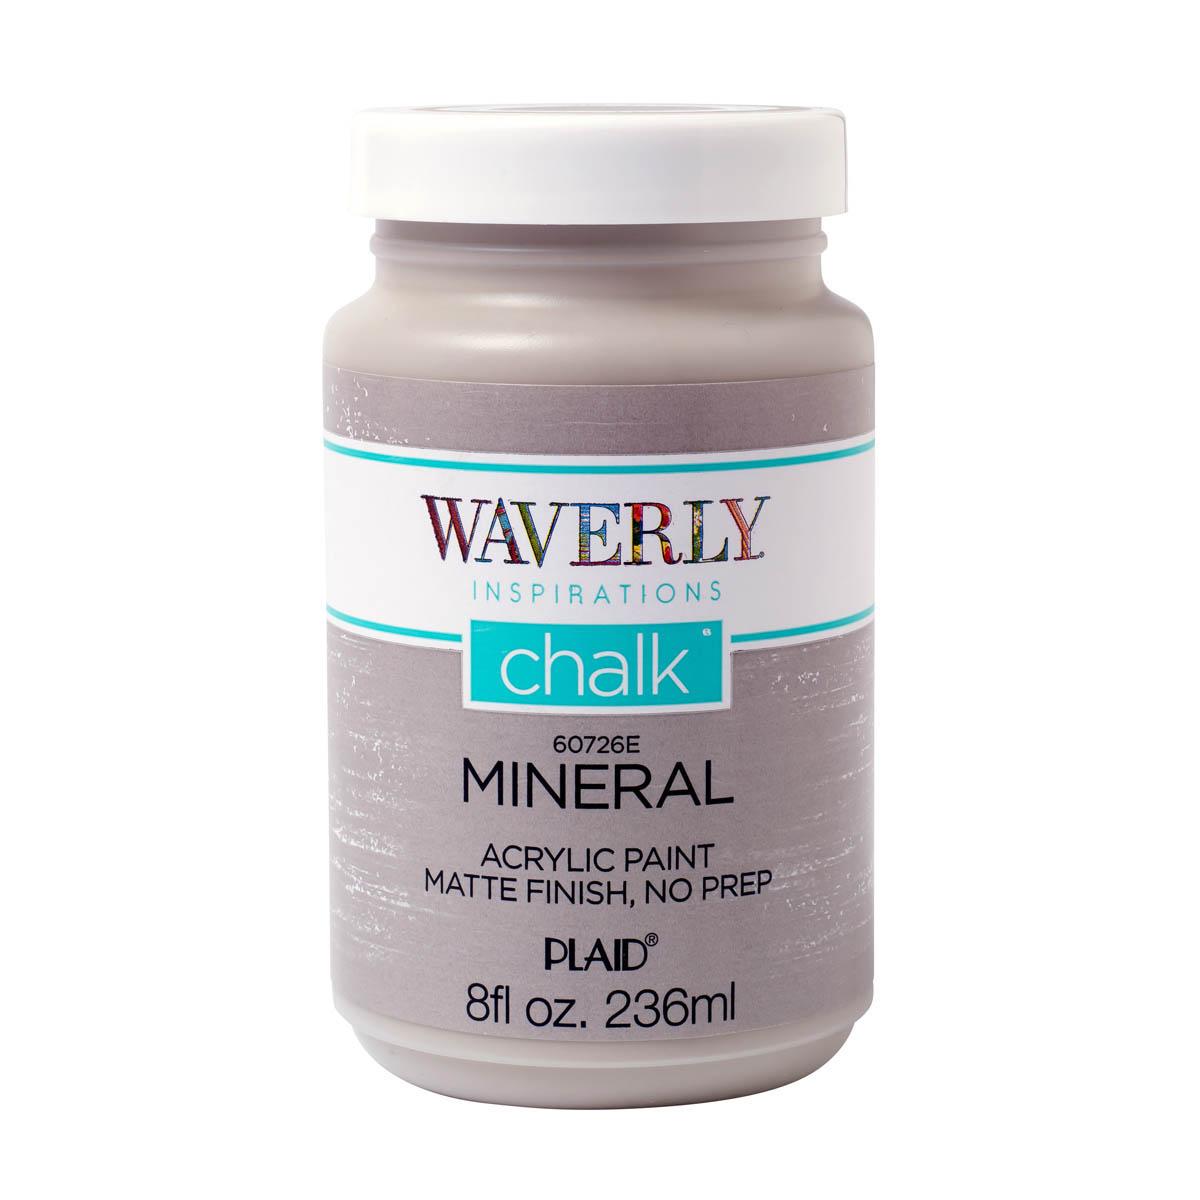 Waverly ® Inspirations Chalk Acrylic Paint - Mineral, 8 oz.